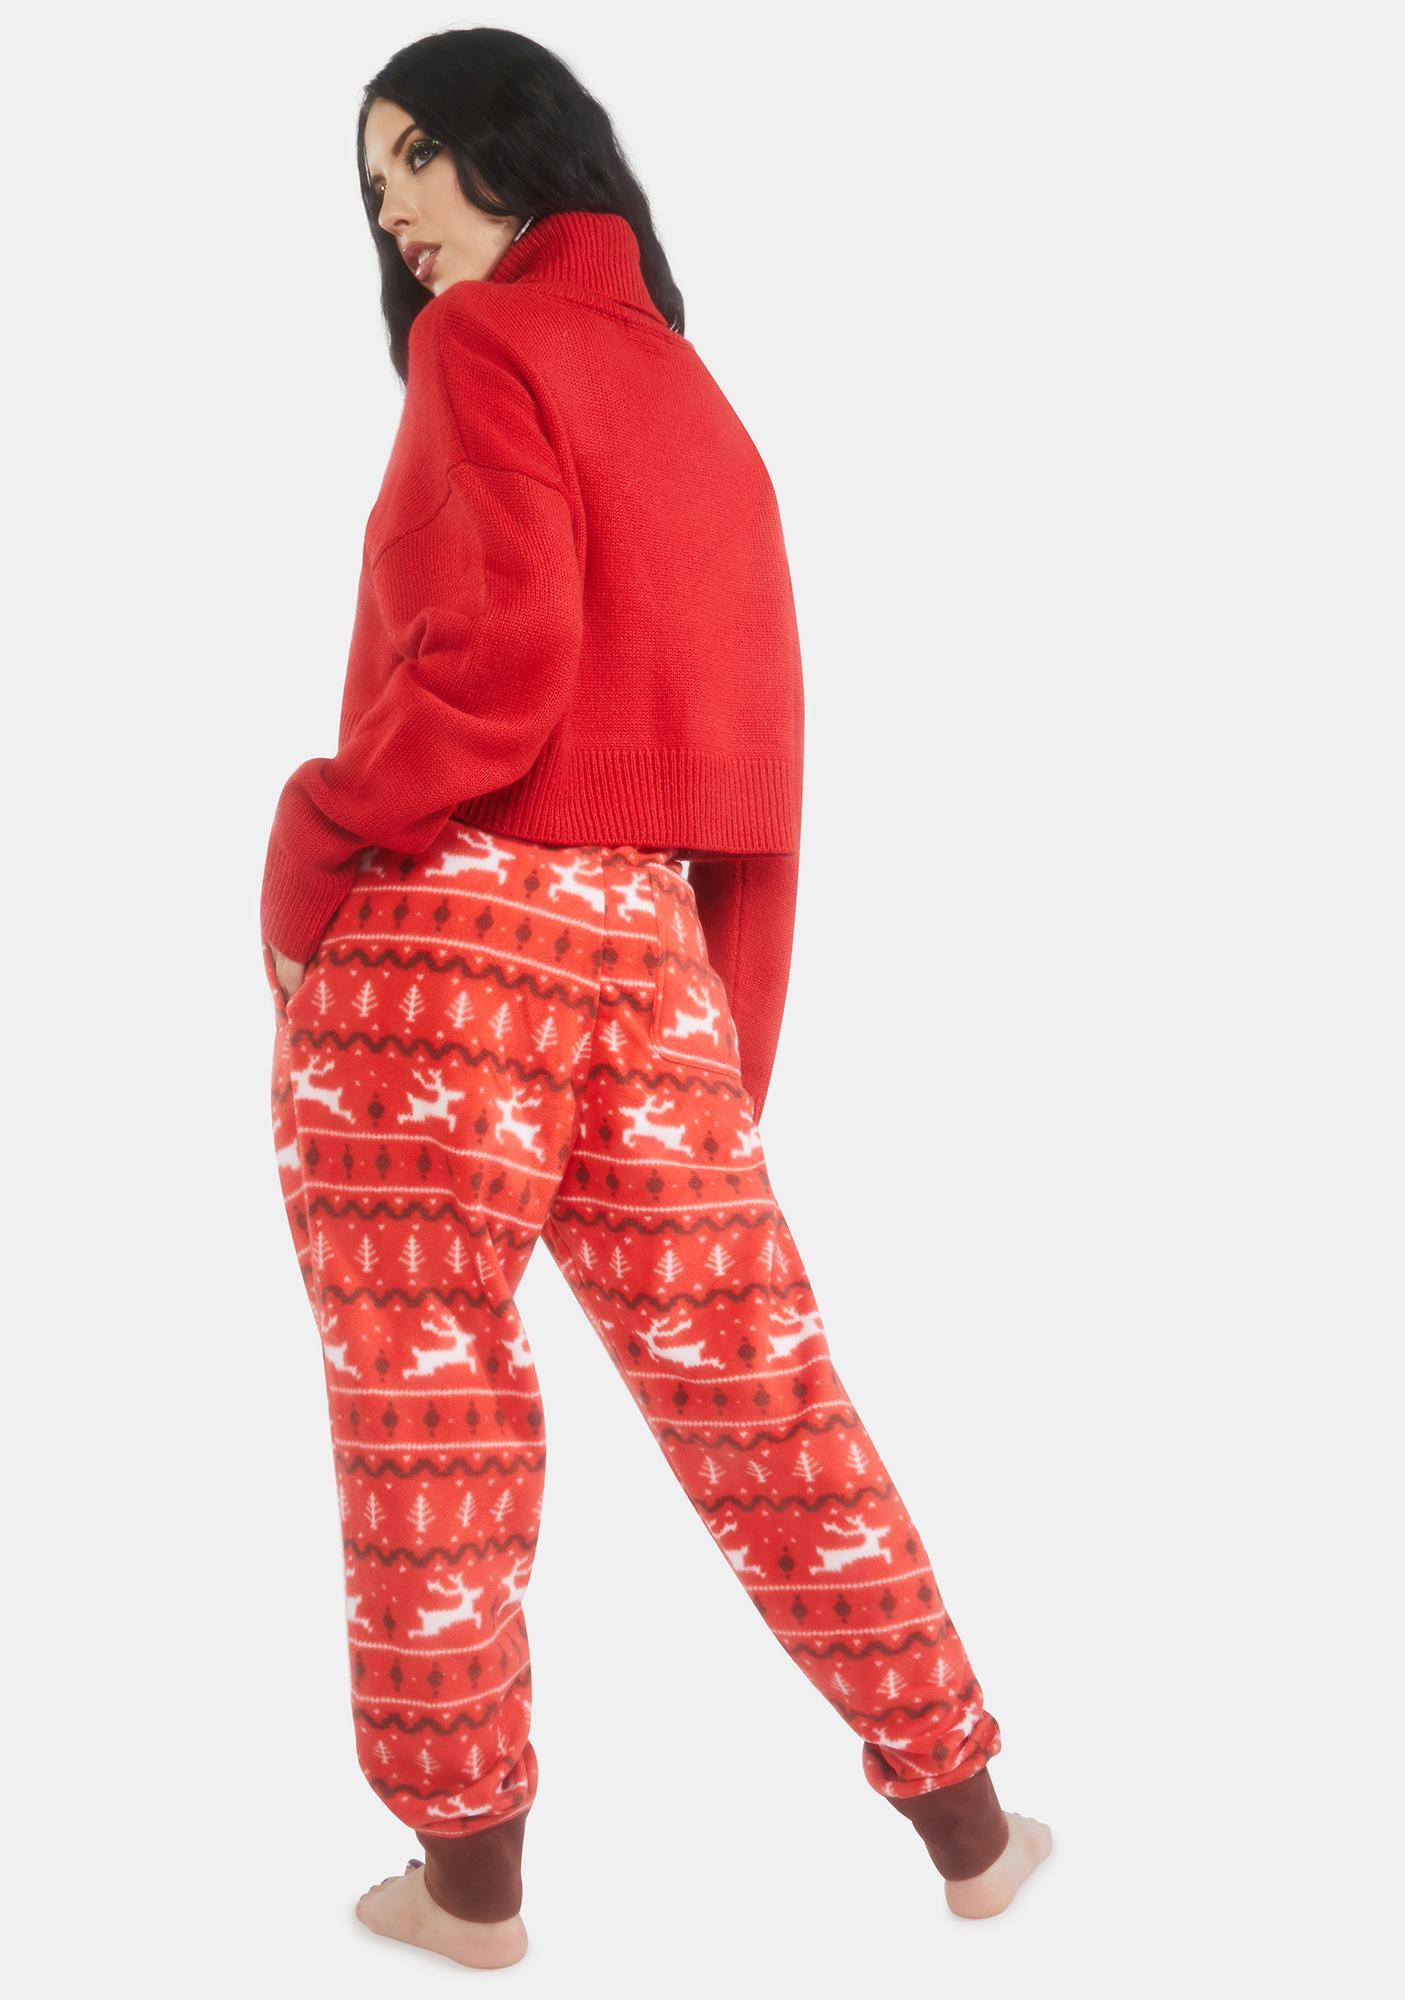 Tipsy Elves Red Reindeer Joggers